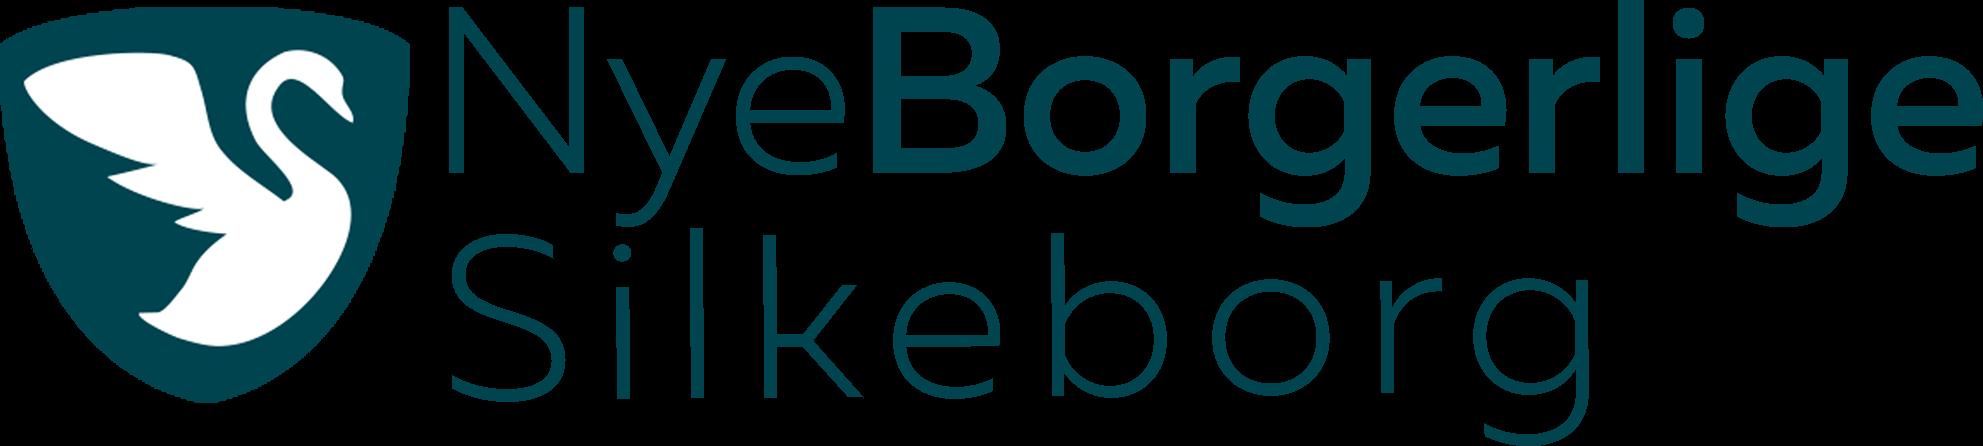 Nye Borgerlige – Silkeborg